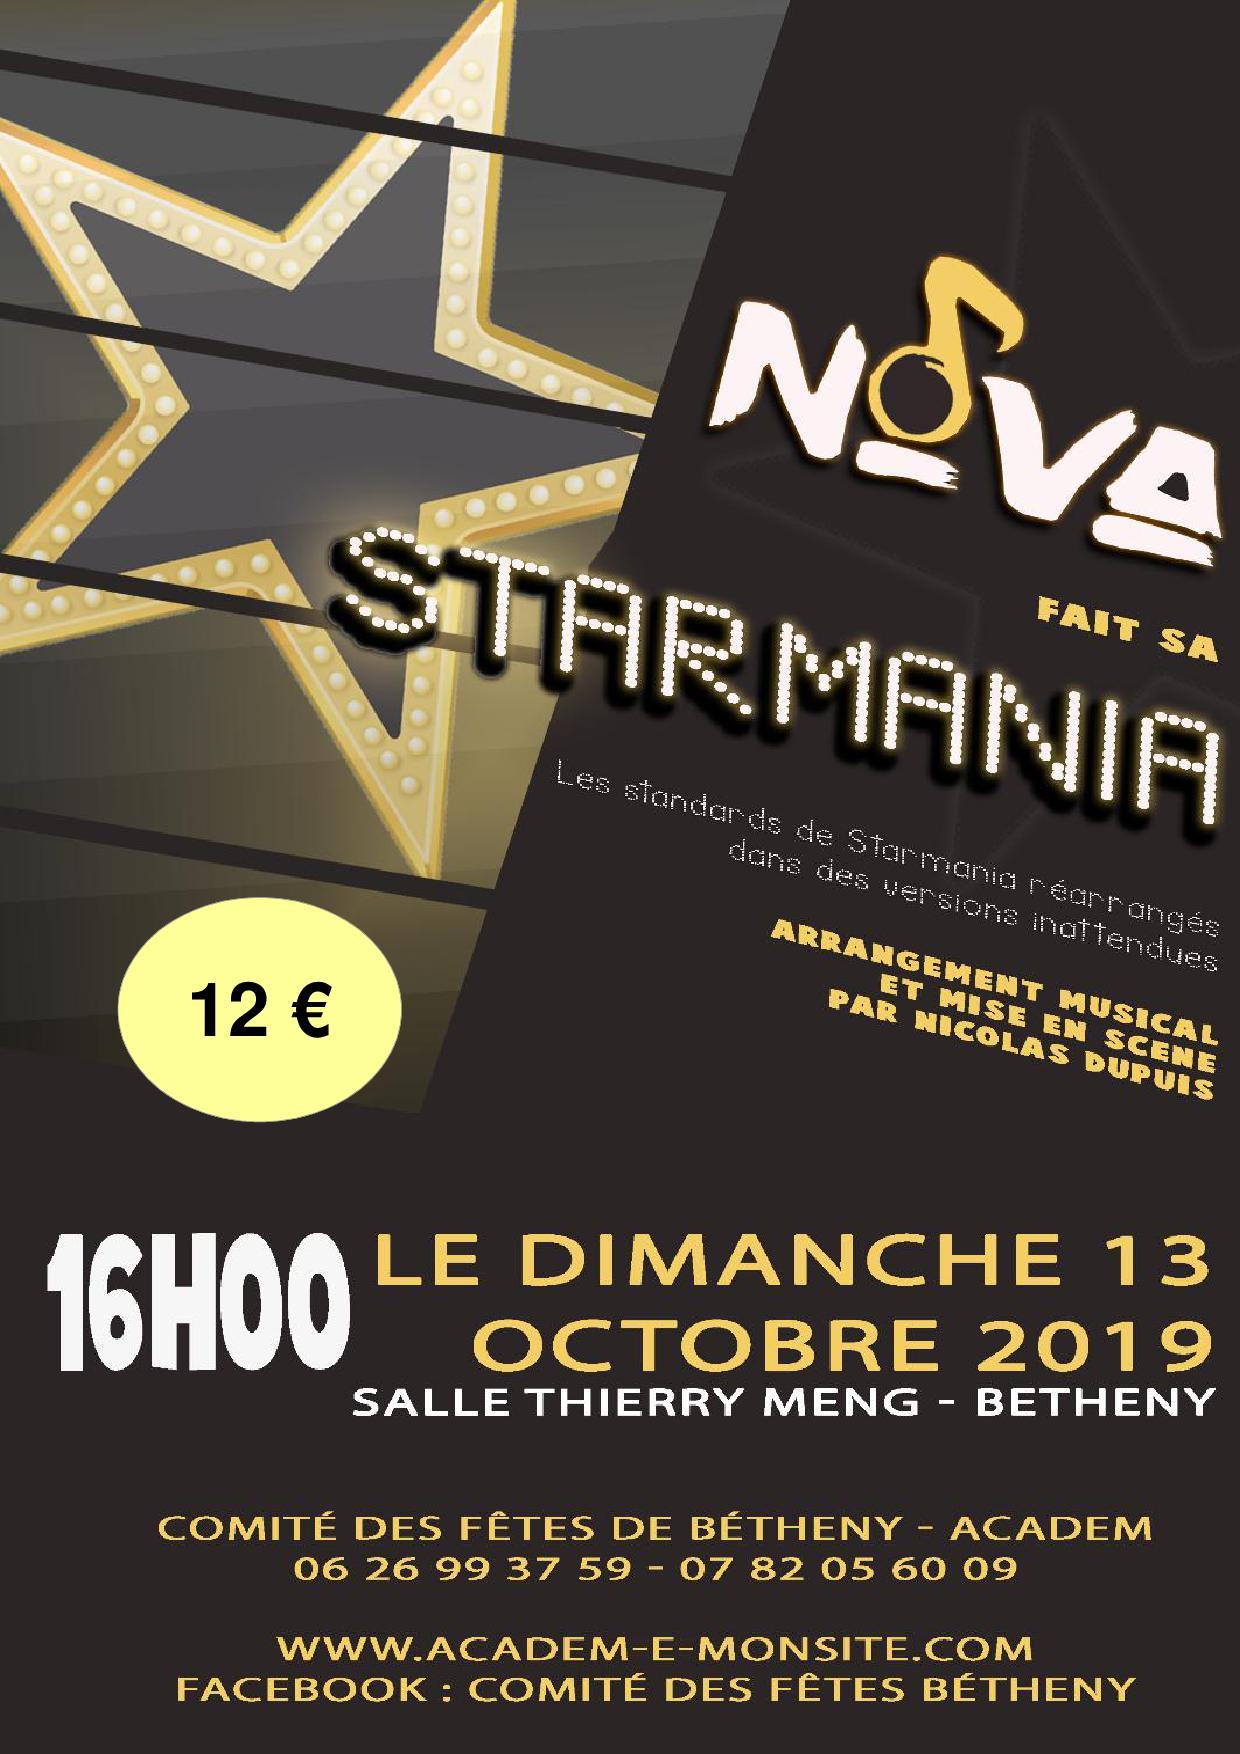 STARMANIA13 OCT 2019